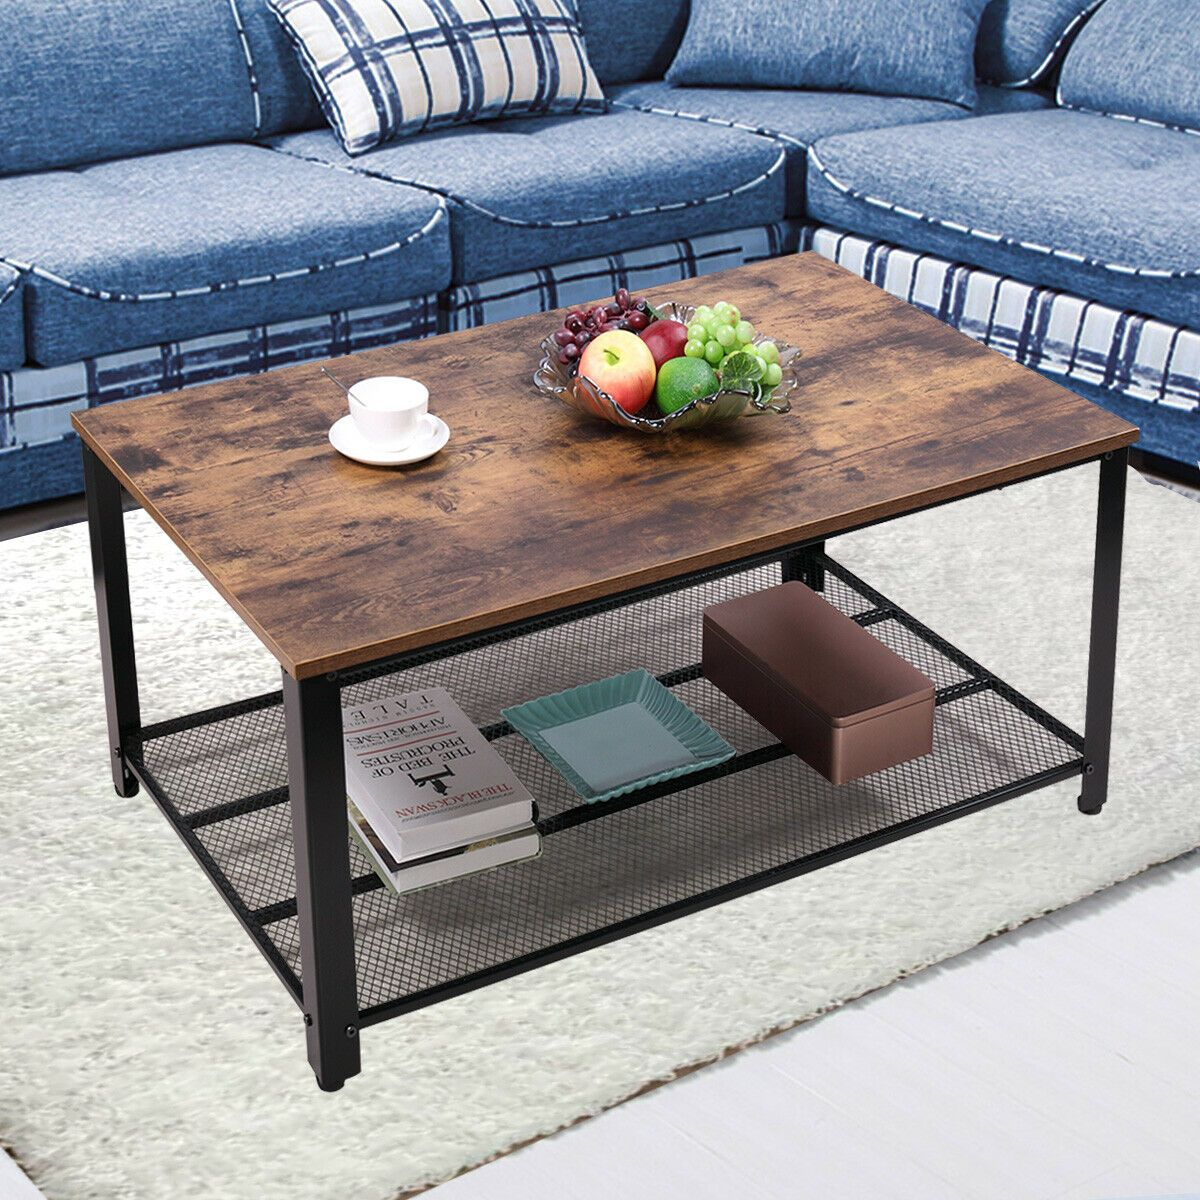 Buy Habitat Nomad Nest Of Tables Oak Effect Nest Of Tables Argos Mid Century Interior Living Room Inspo Coffee Table [ 1000 x 1000 Pixel ]